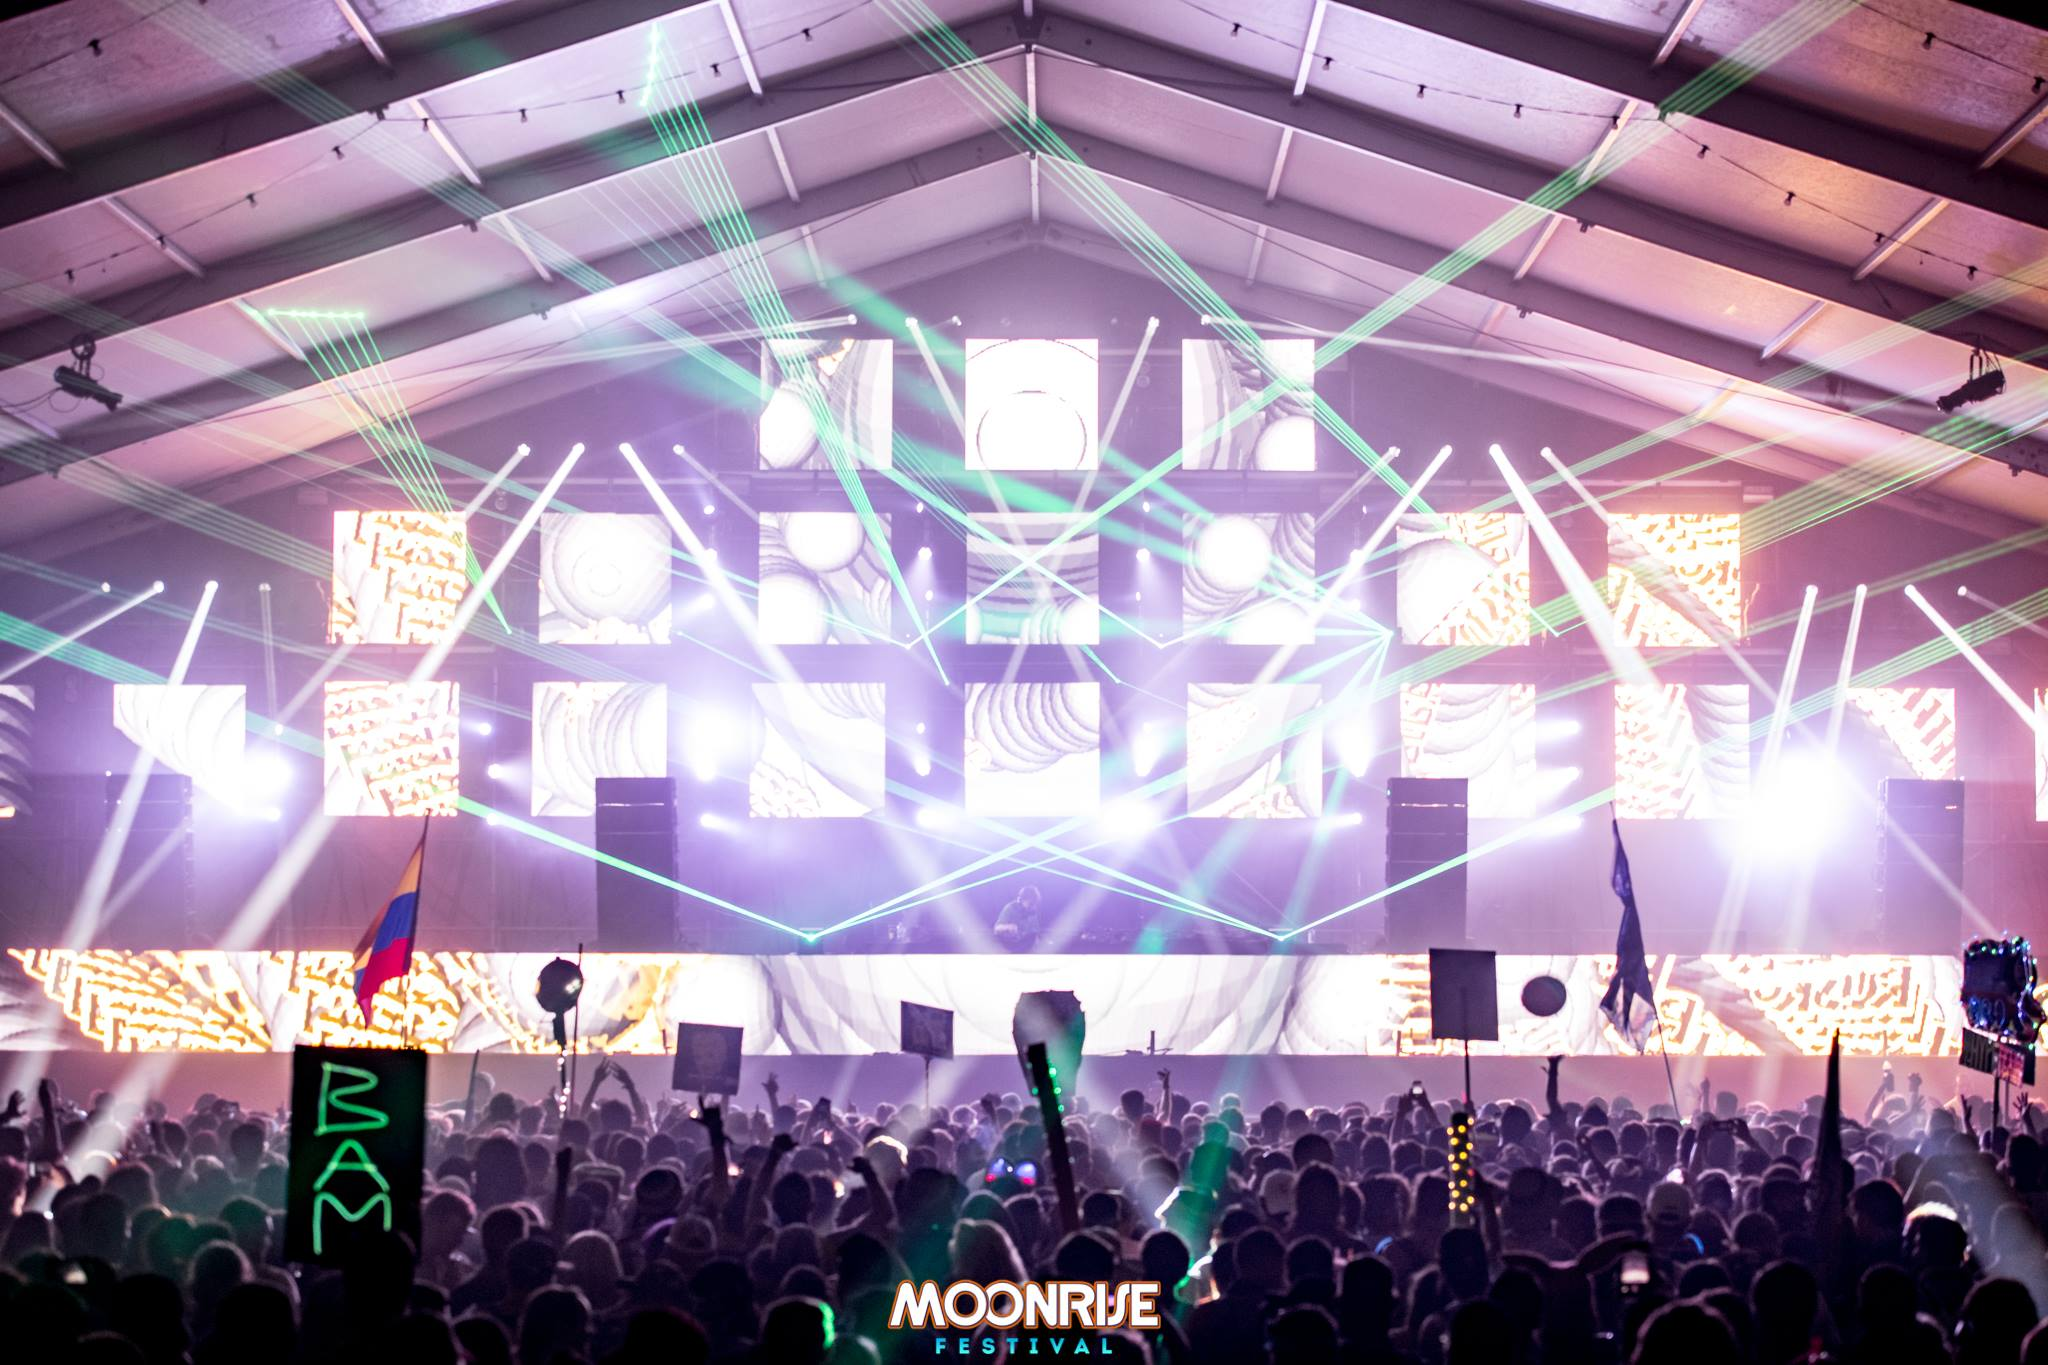 LISTEN: Moonrise 2019 Live Sets From Illenium, NGHTMRE x